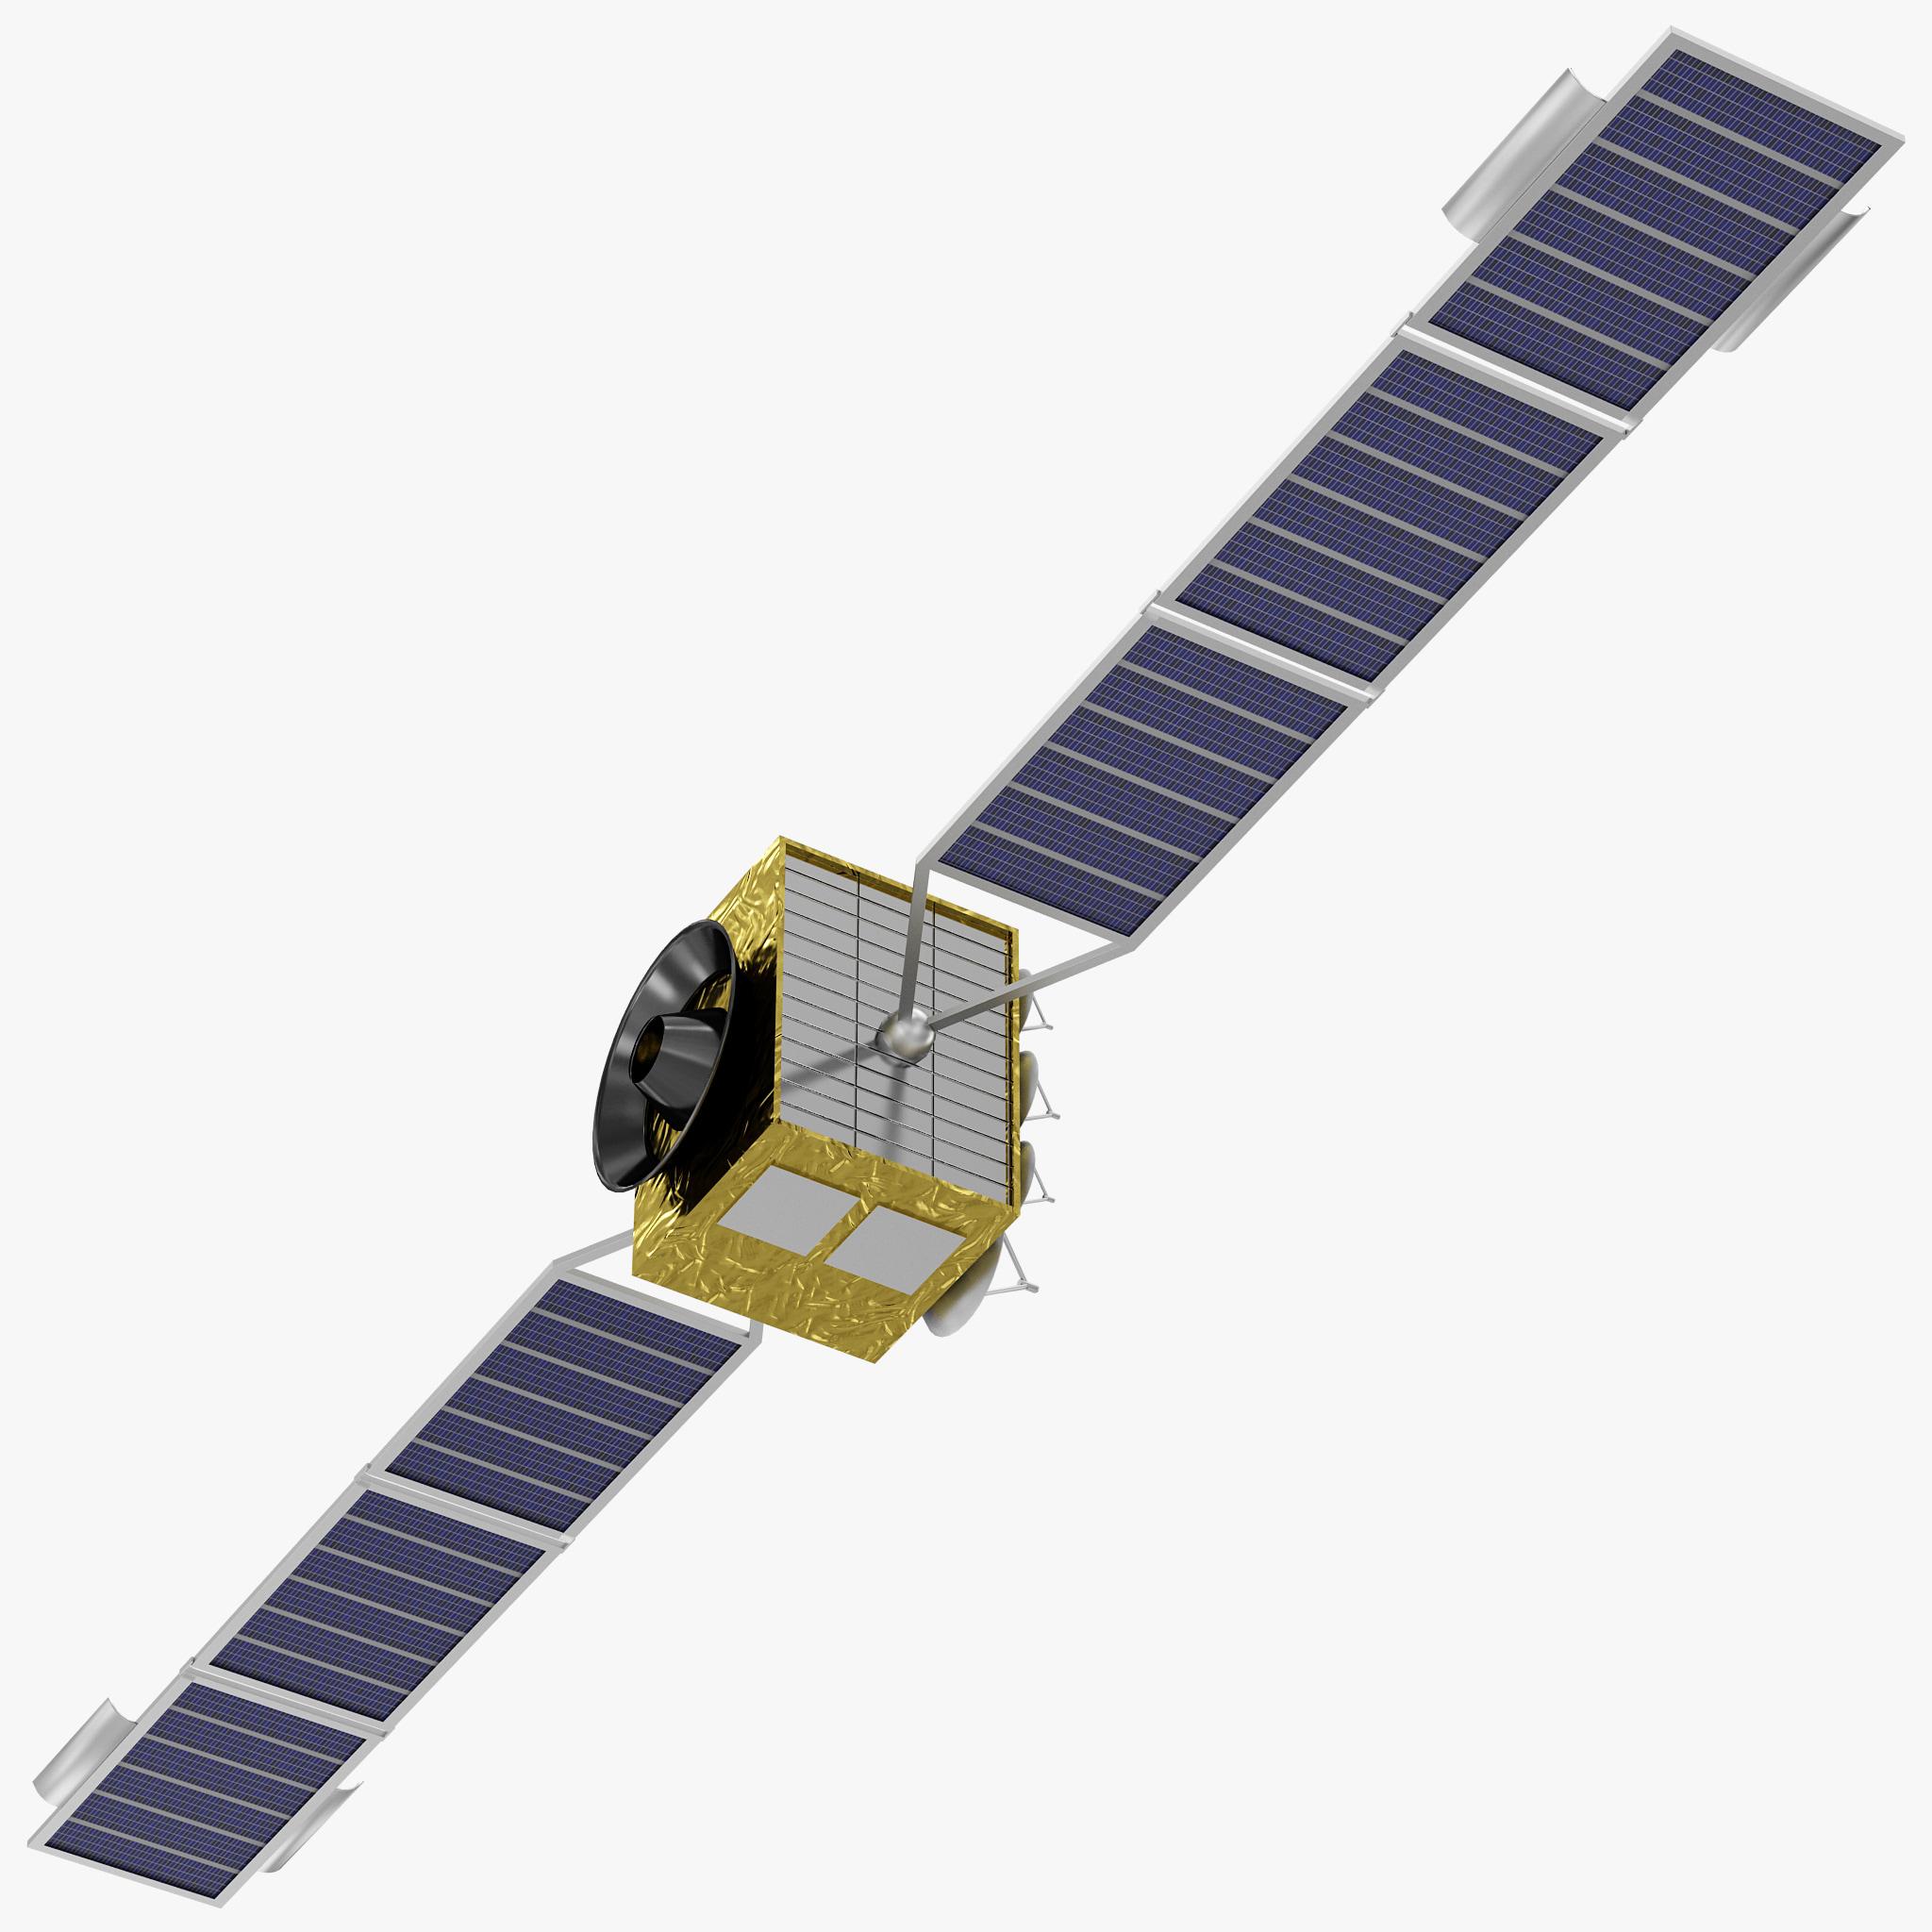 Communications Satellite EKS_1.jpg